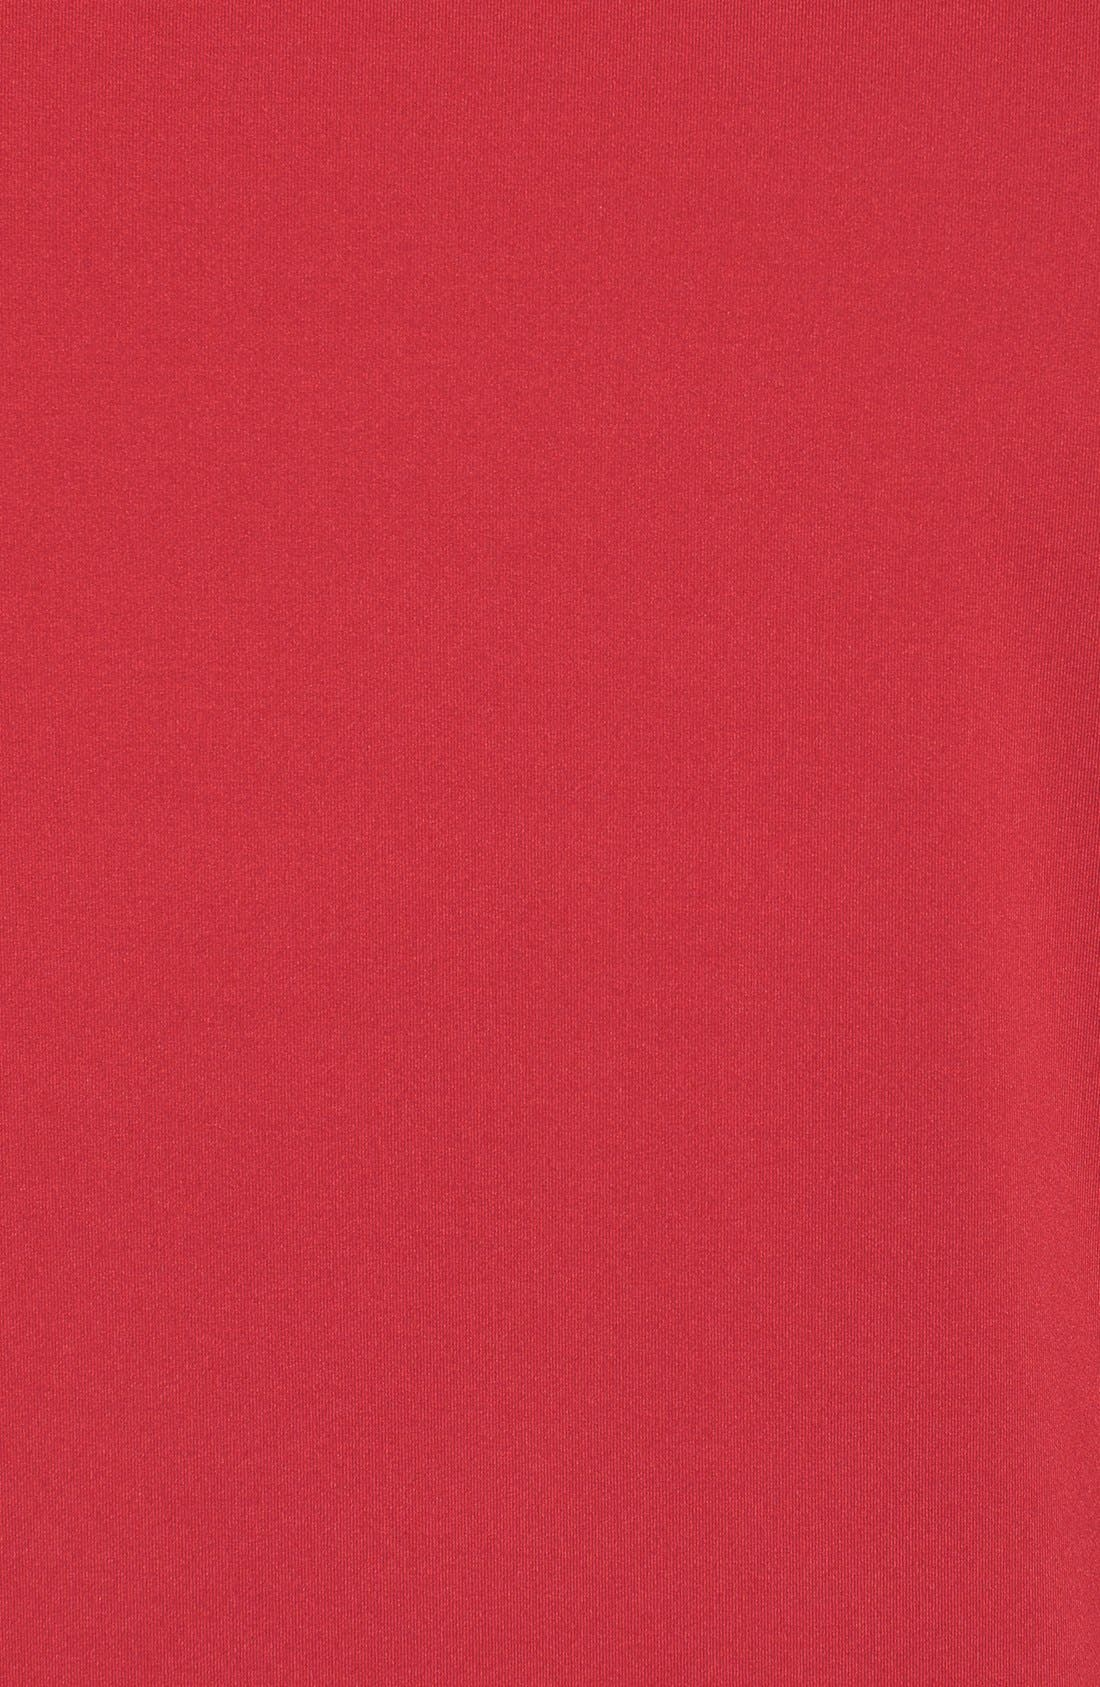 Alternate Image 3  - Athletic Recon 'Python' Performance T-Shirt